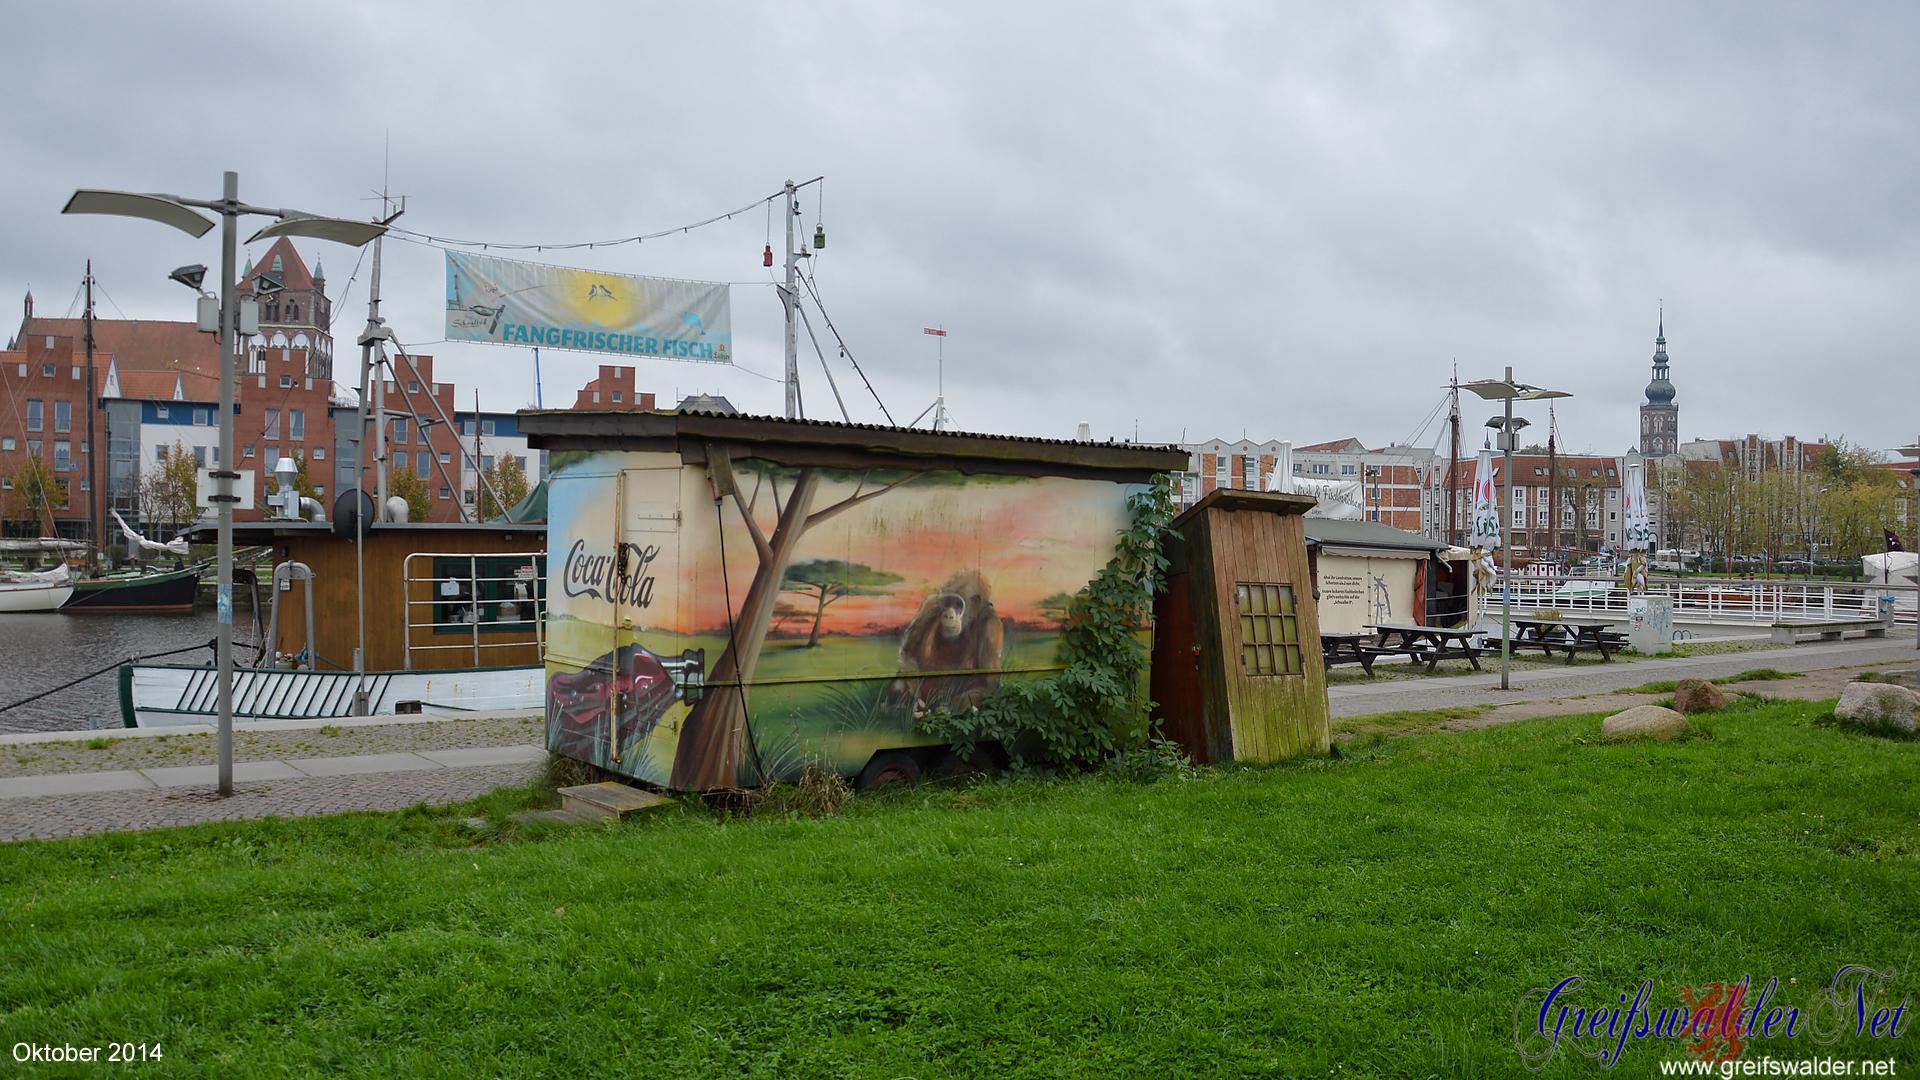 Museumshafen in Greifswald - Oktober 2014